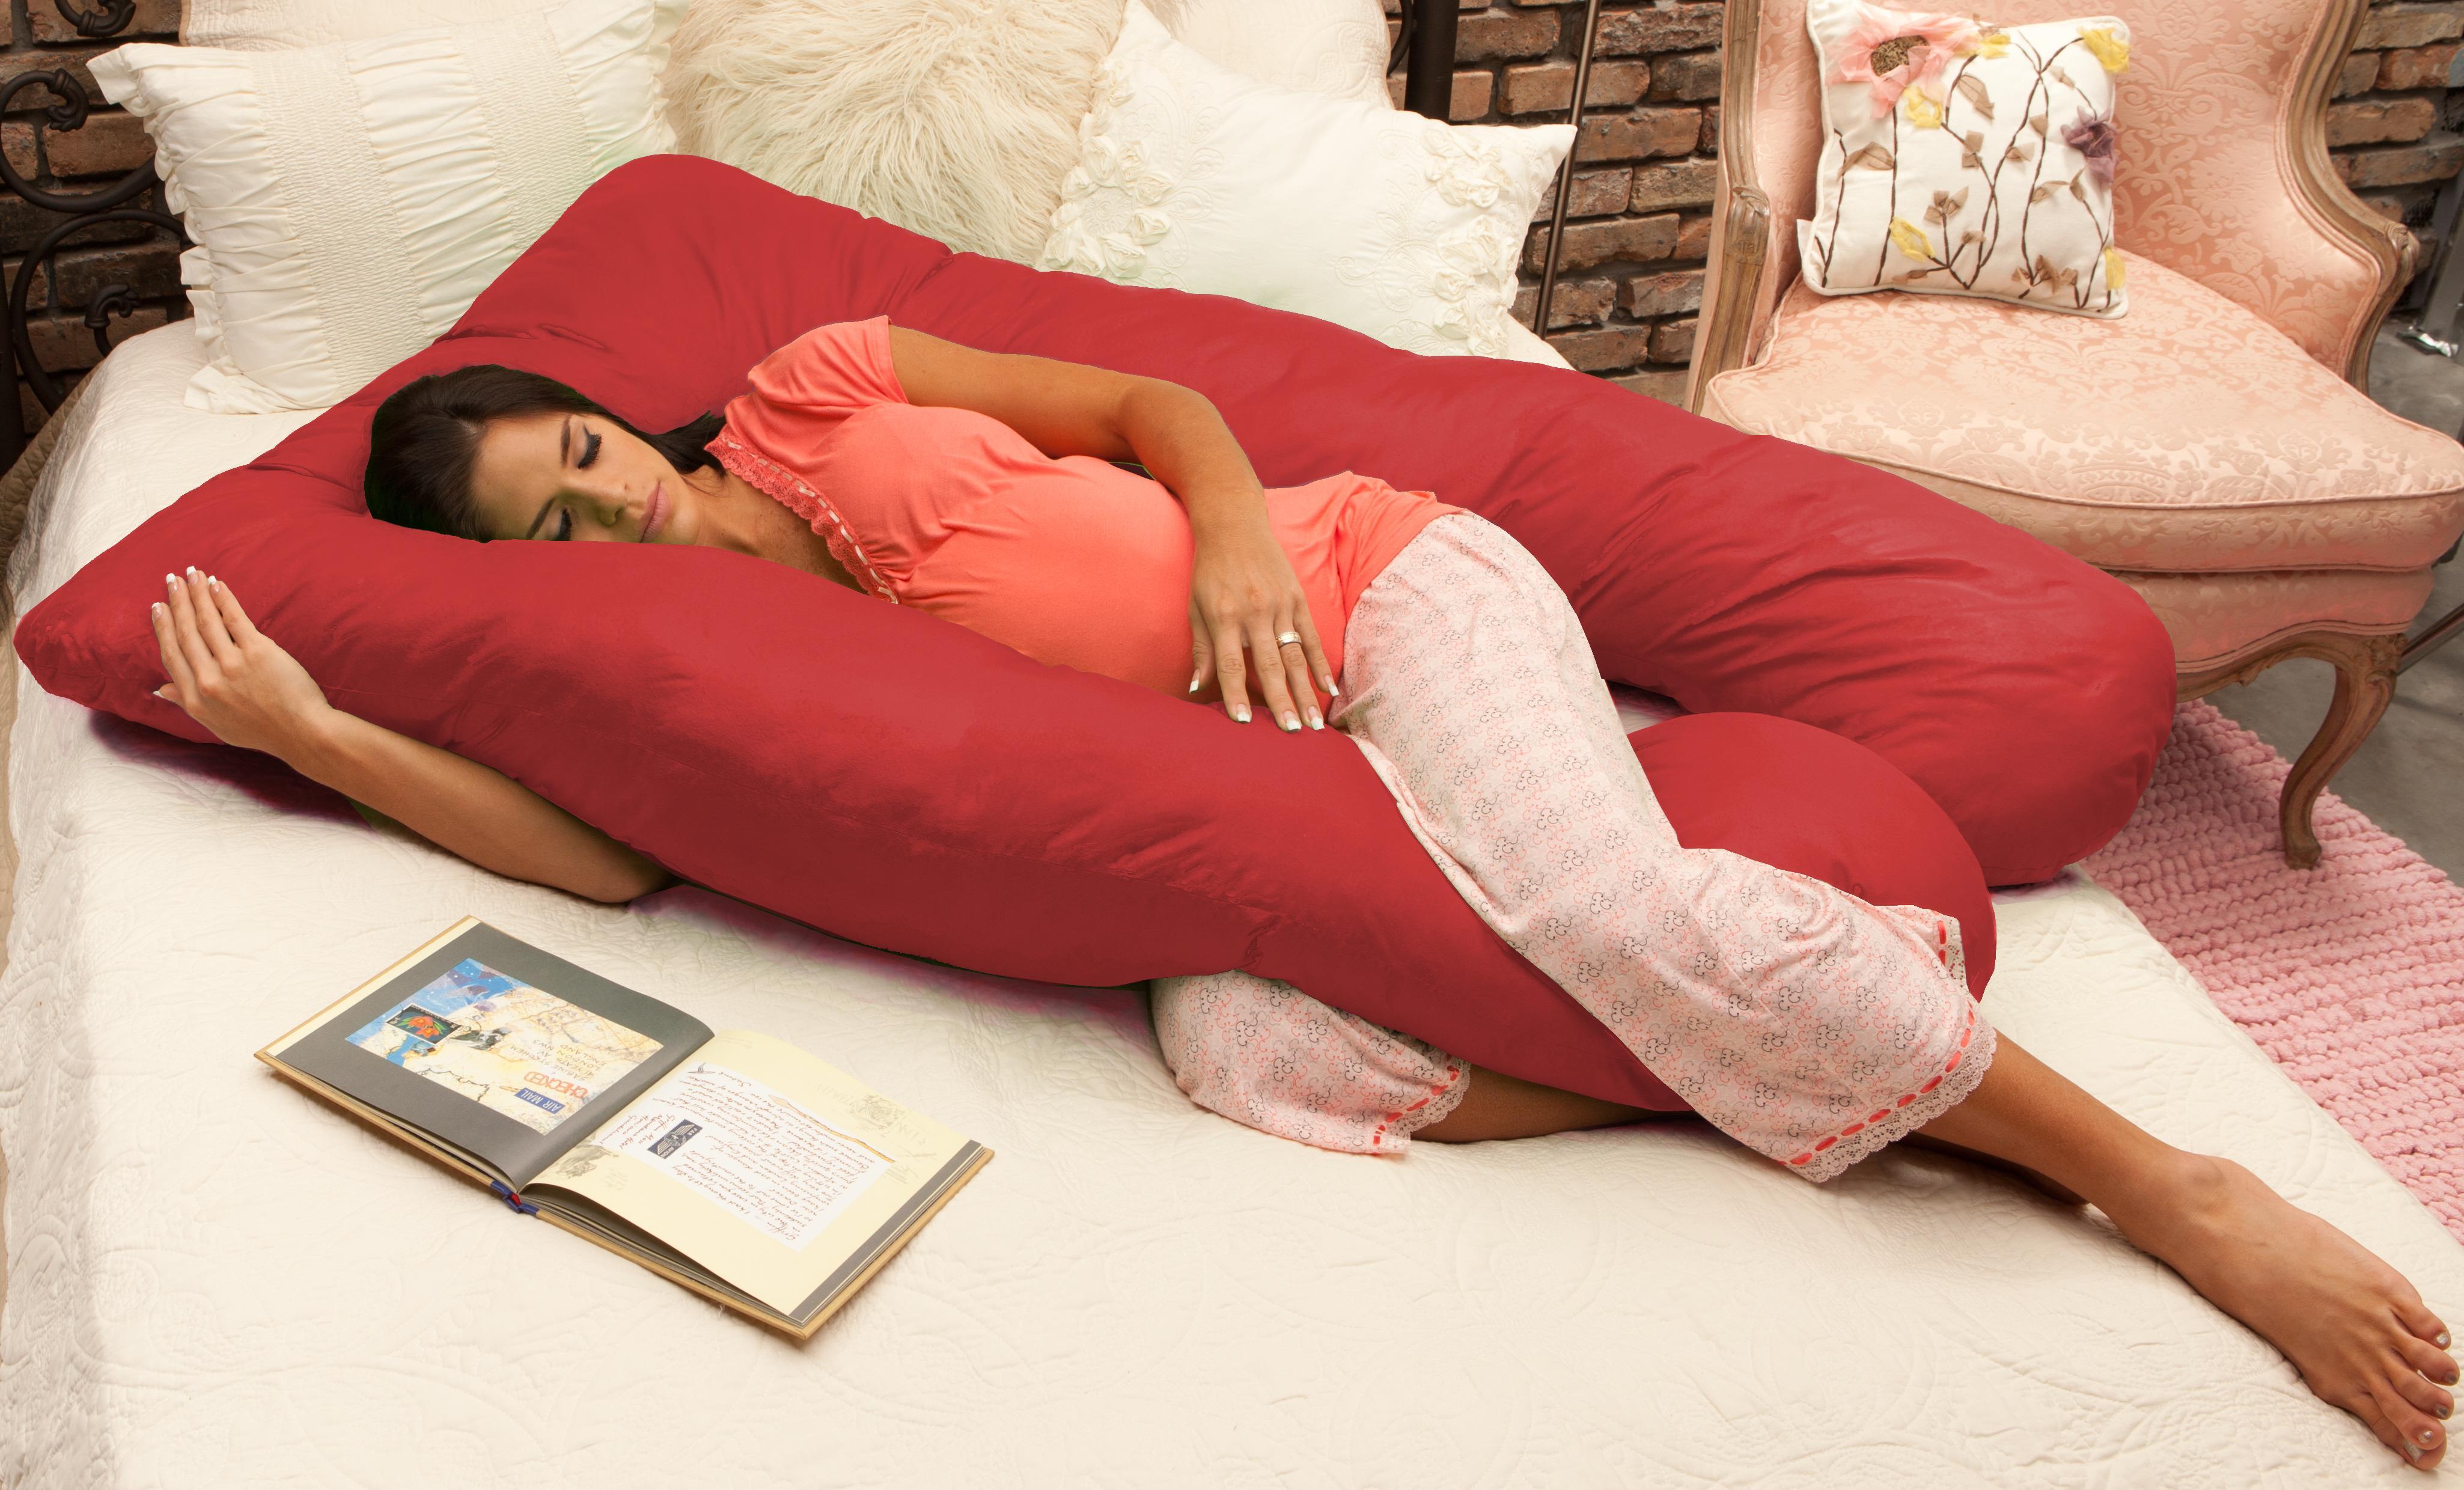 naomi home 11104 naomi home cozy body pillow. Black Bedroom Furniture Sets. Home Design Ideas